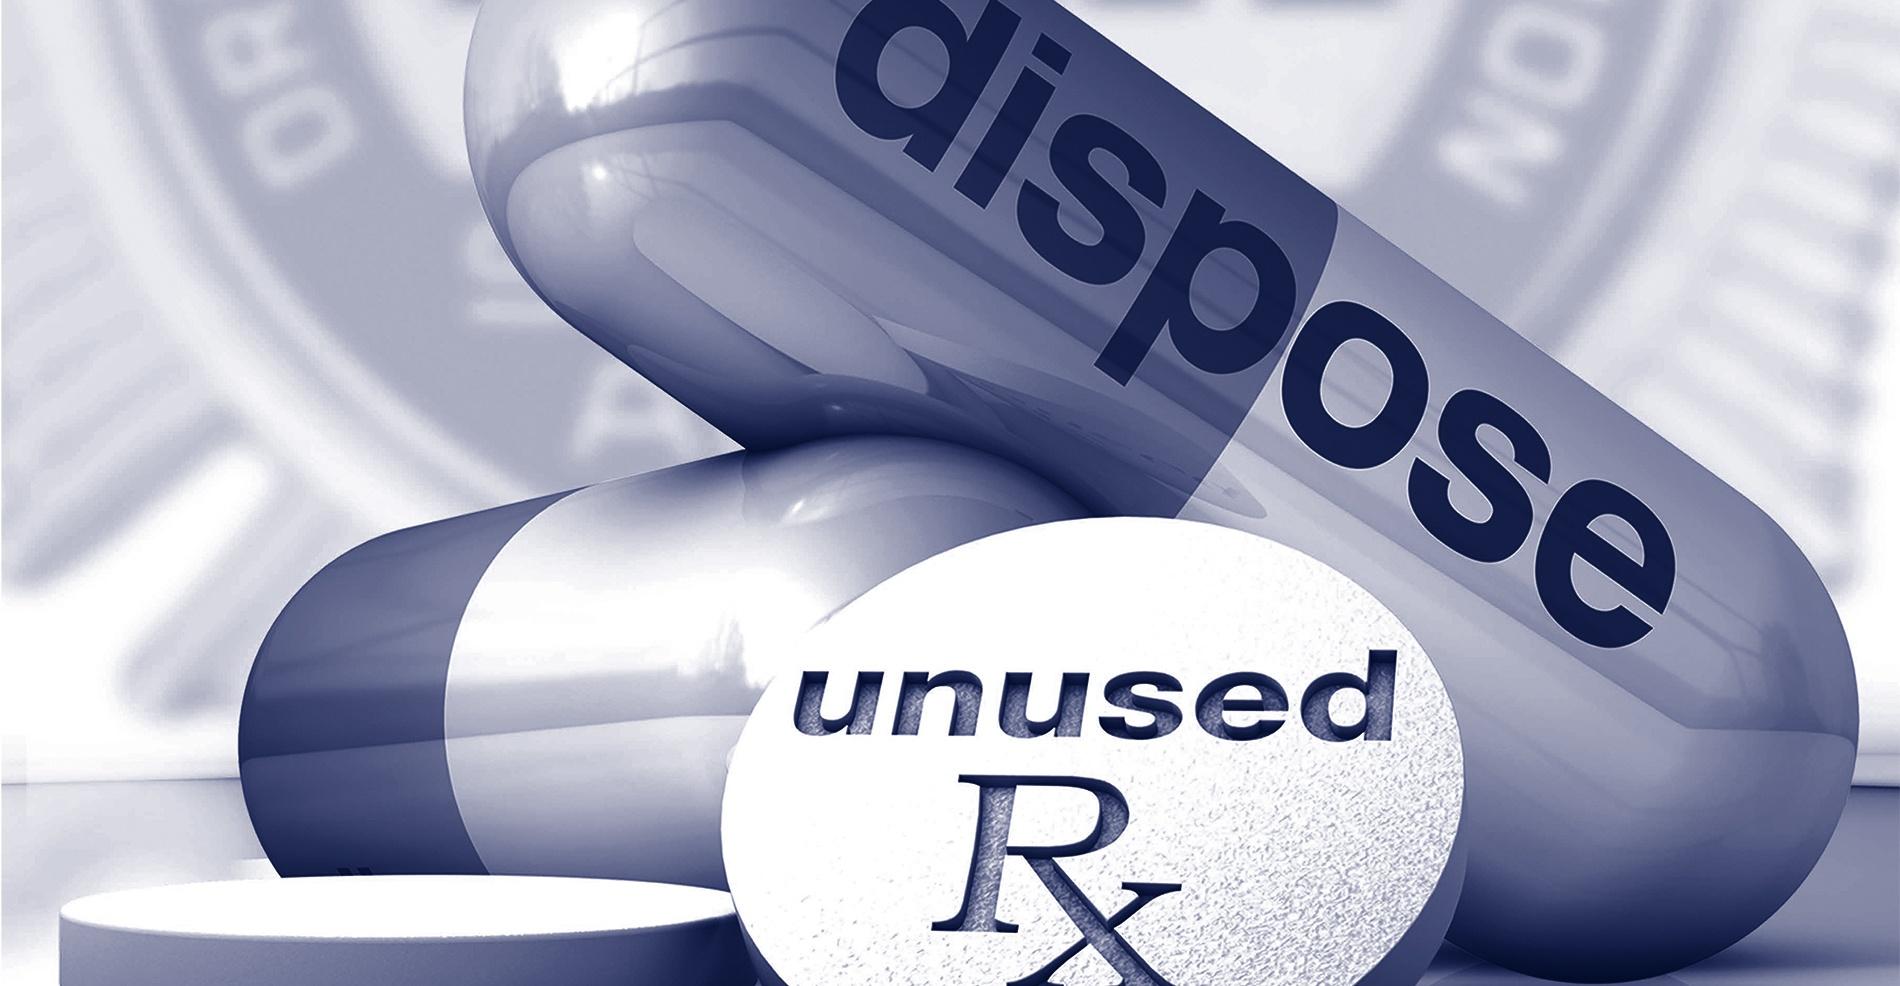 drug_takeback_1900x986_DUO.jpg